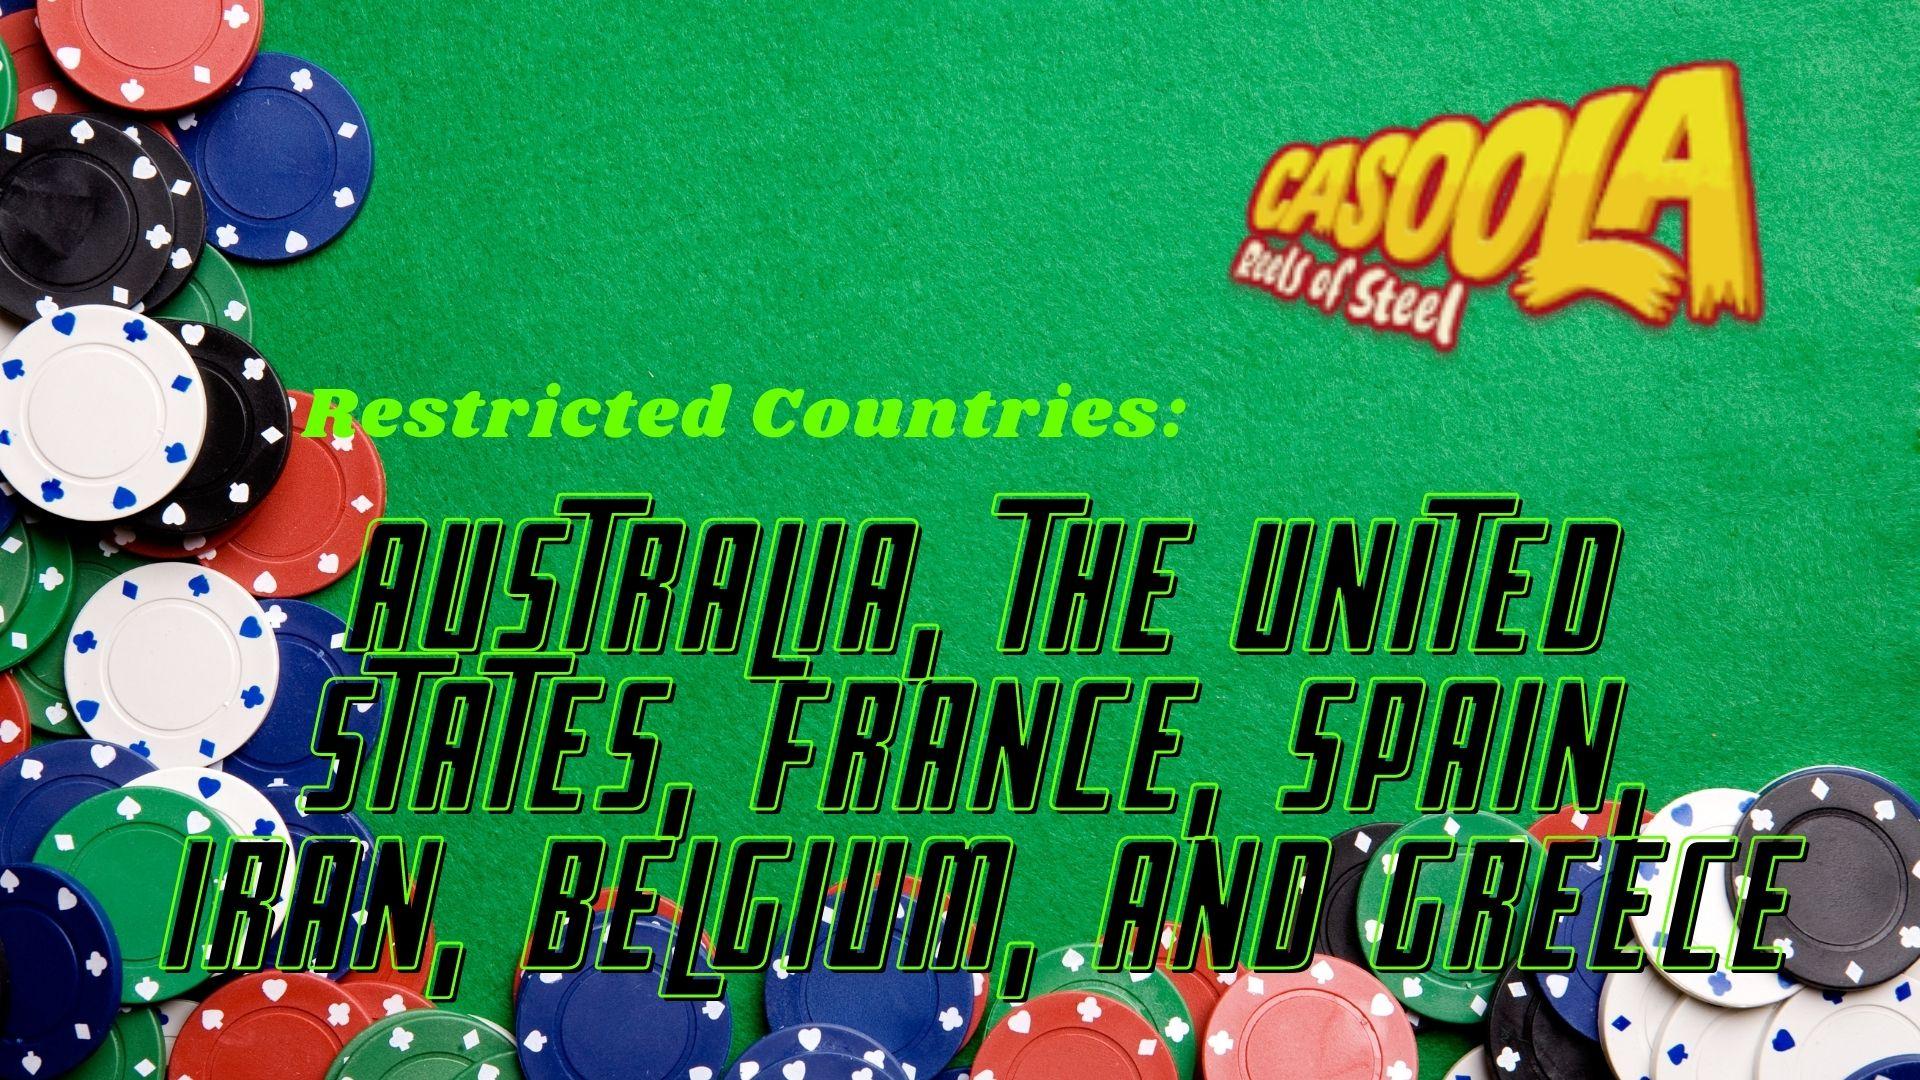 Casoola Casino Restricted Countries